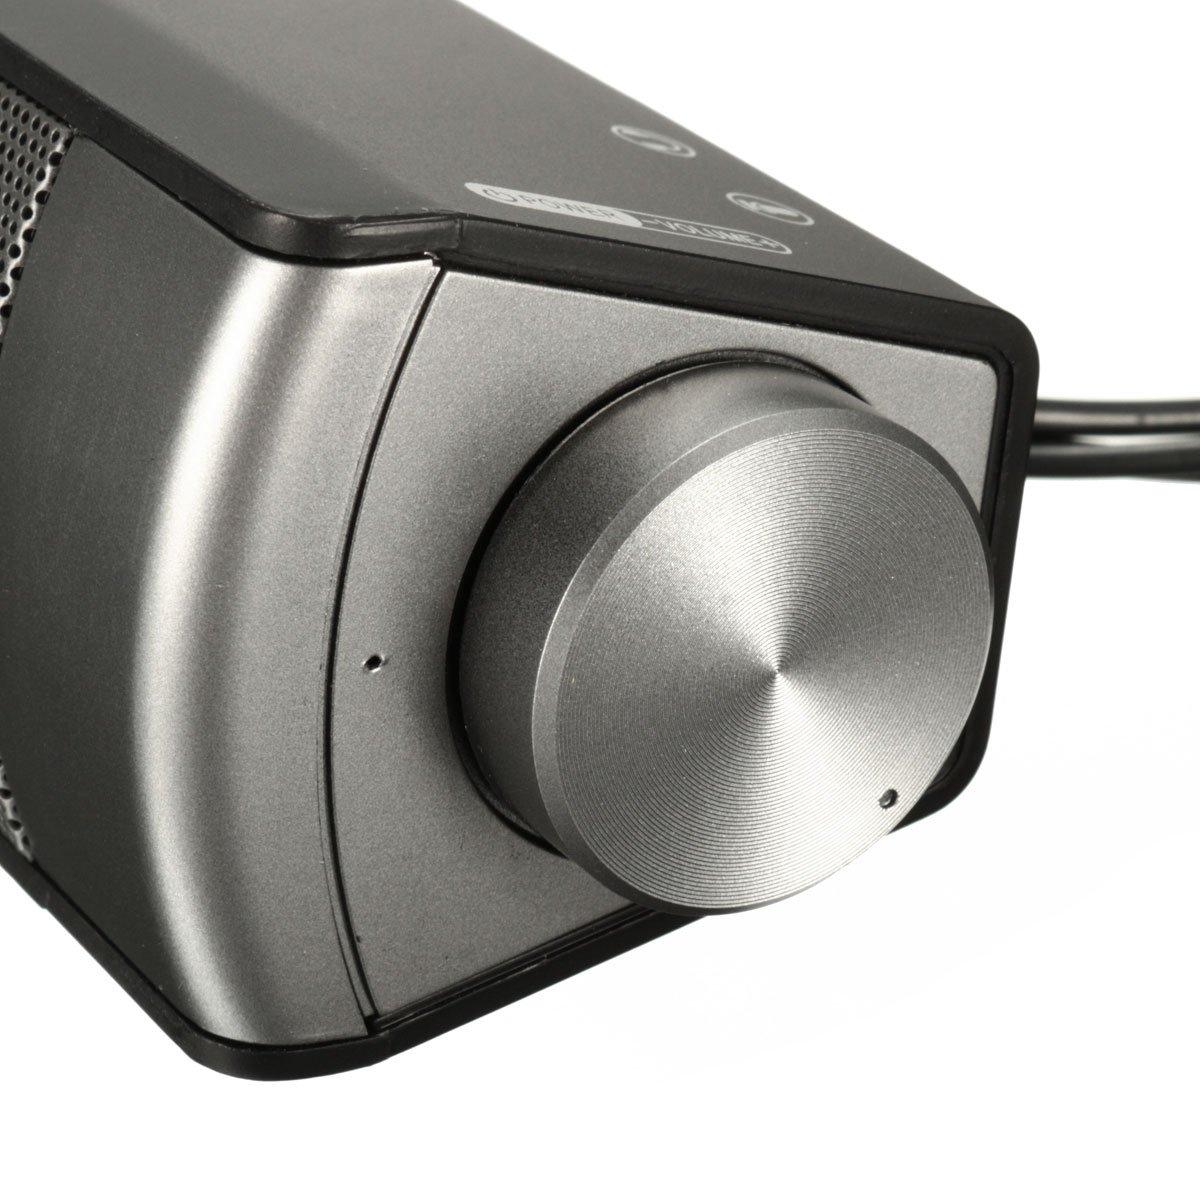 QOJA muses midas-2.0 usb multimedia speaker music play soundbar by QOJA (Image #3)